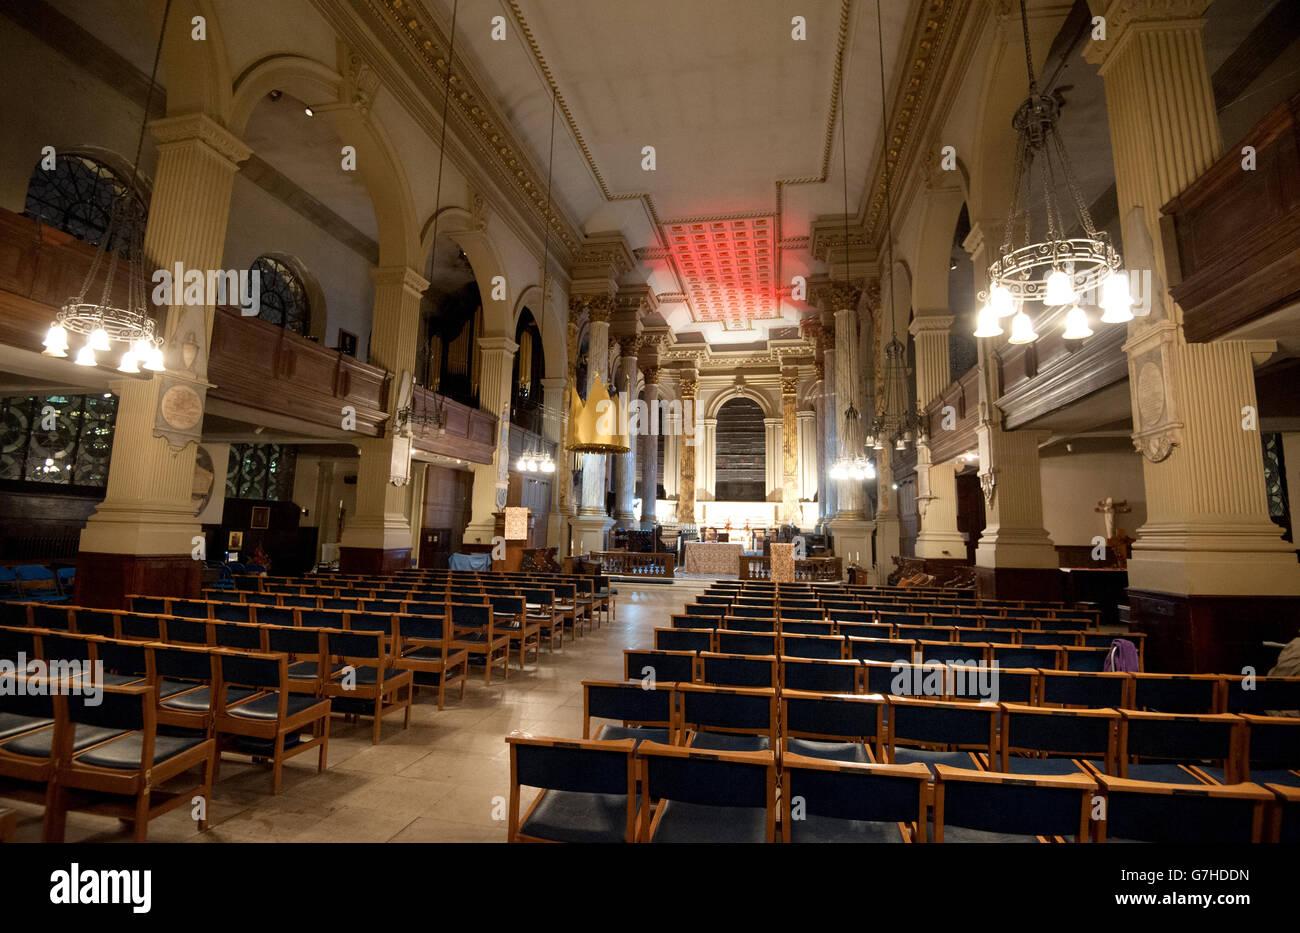 Birmingham Cathedral - General Views - Stock Image